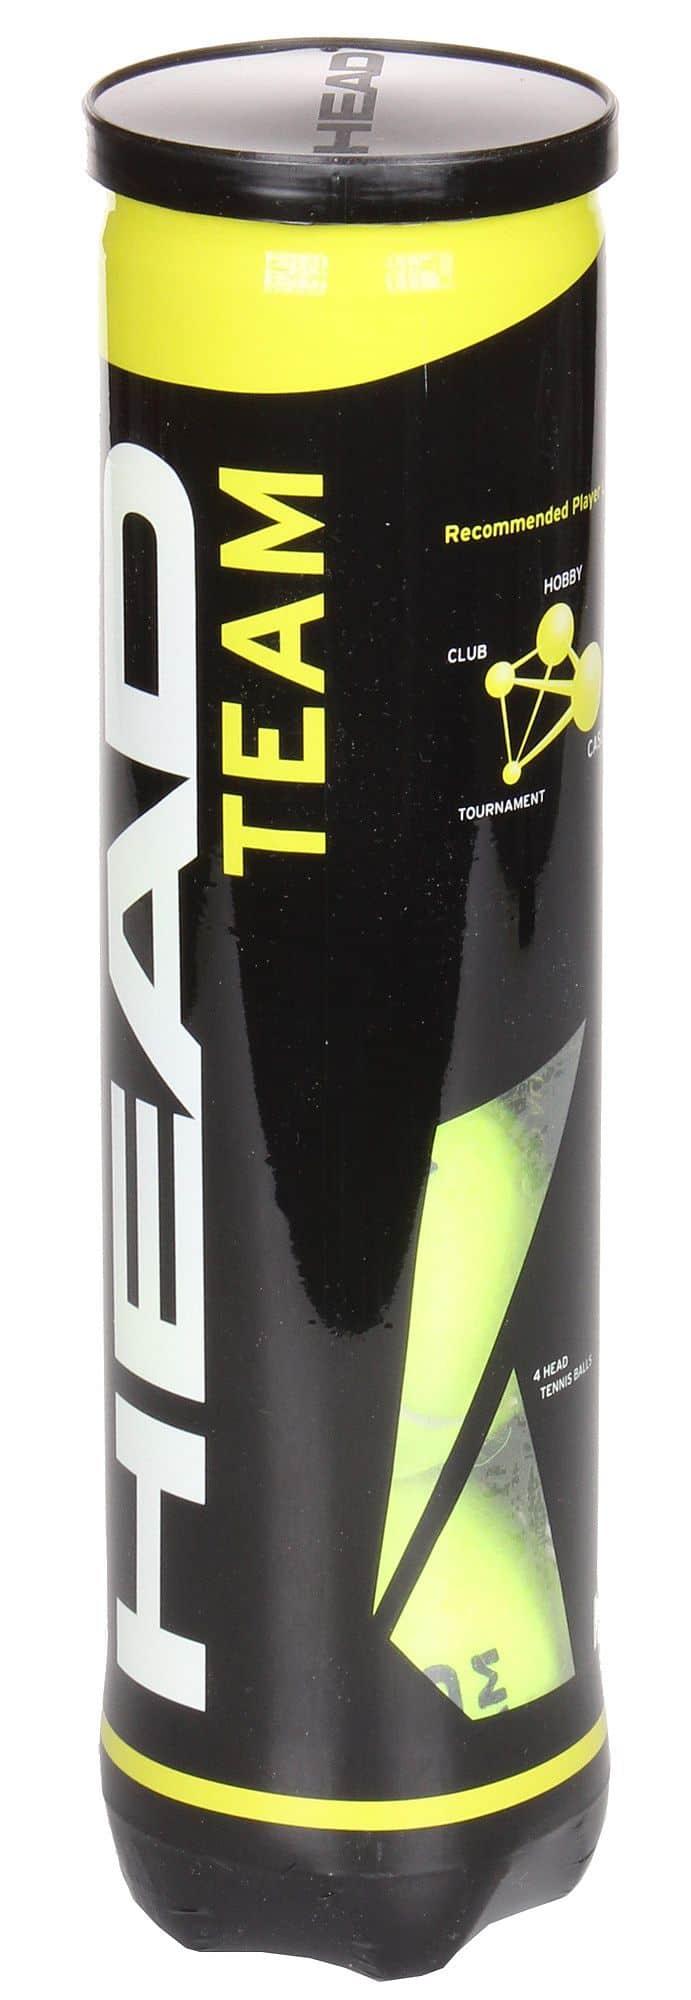 TEAM tenisové míče balení: 4 ks